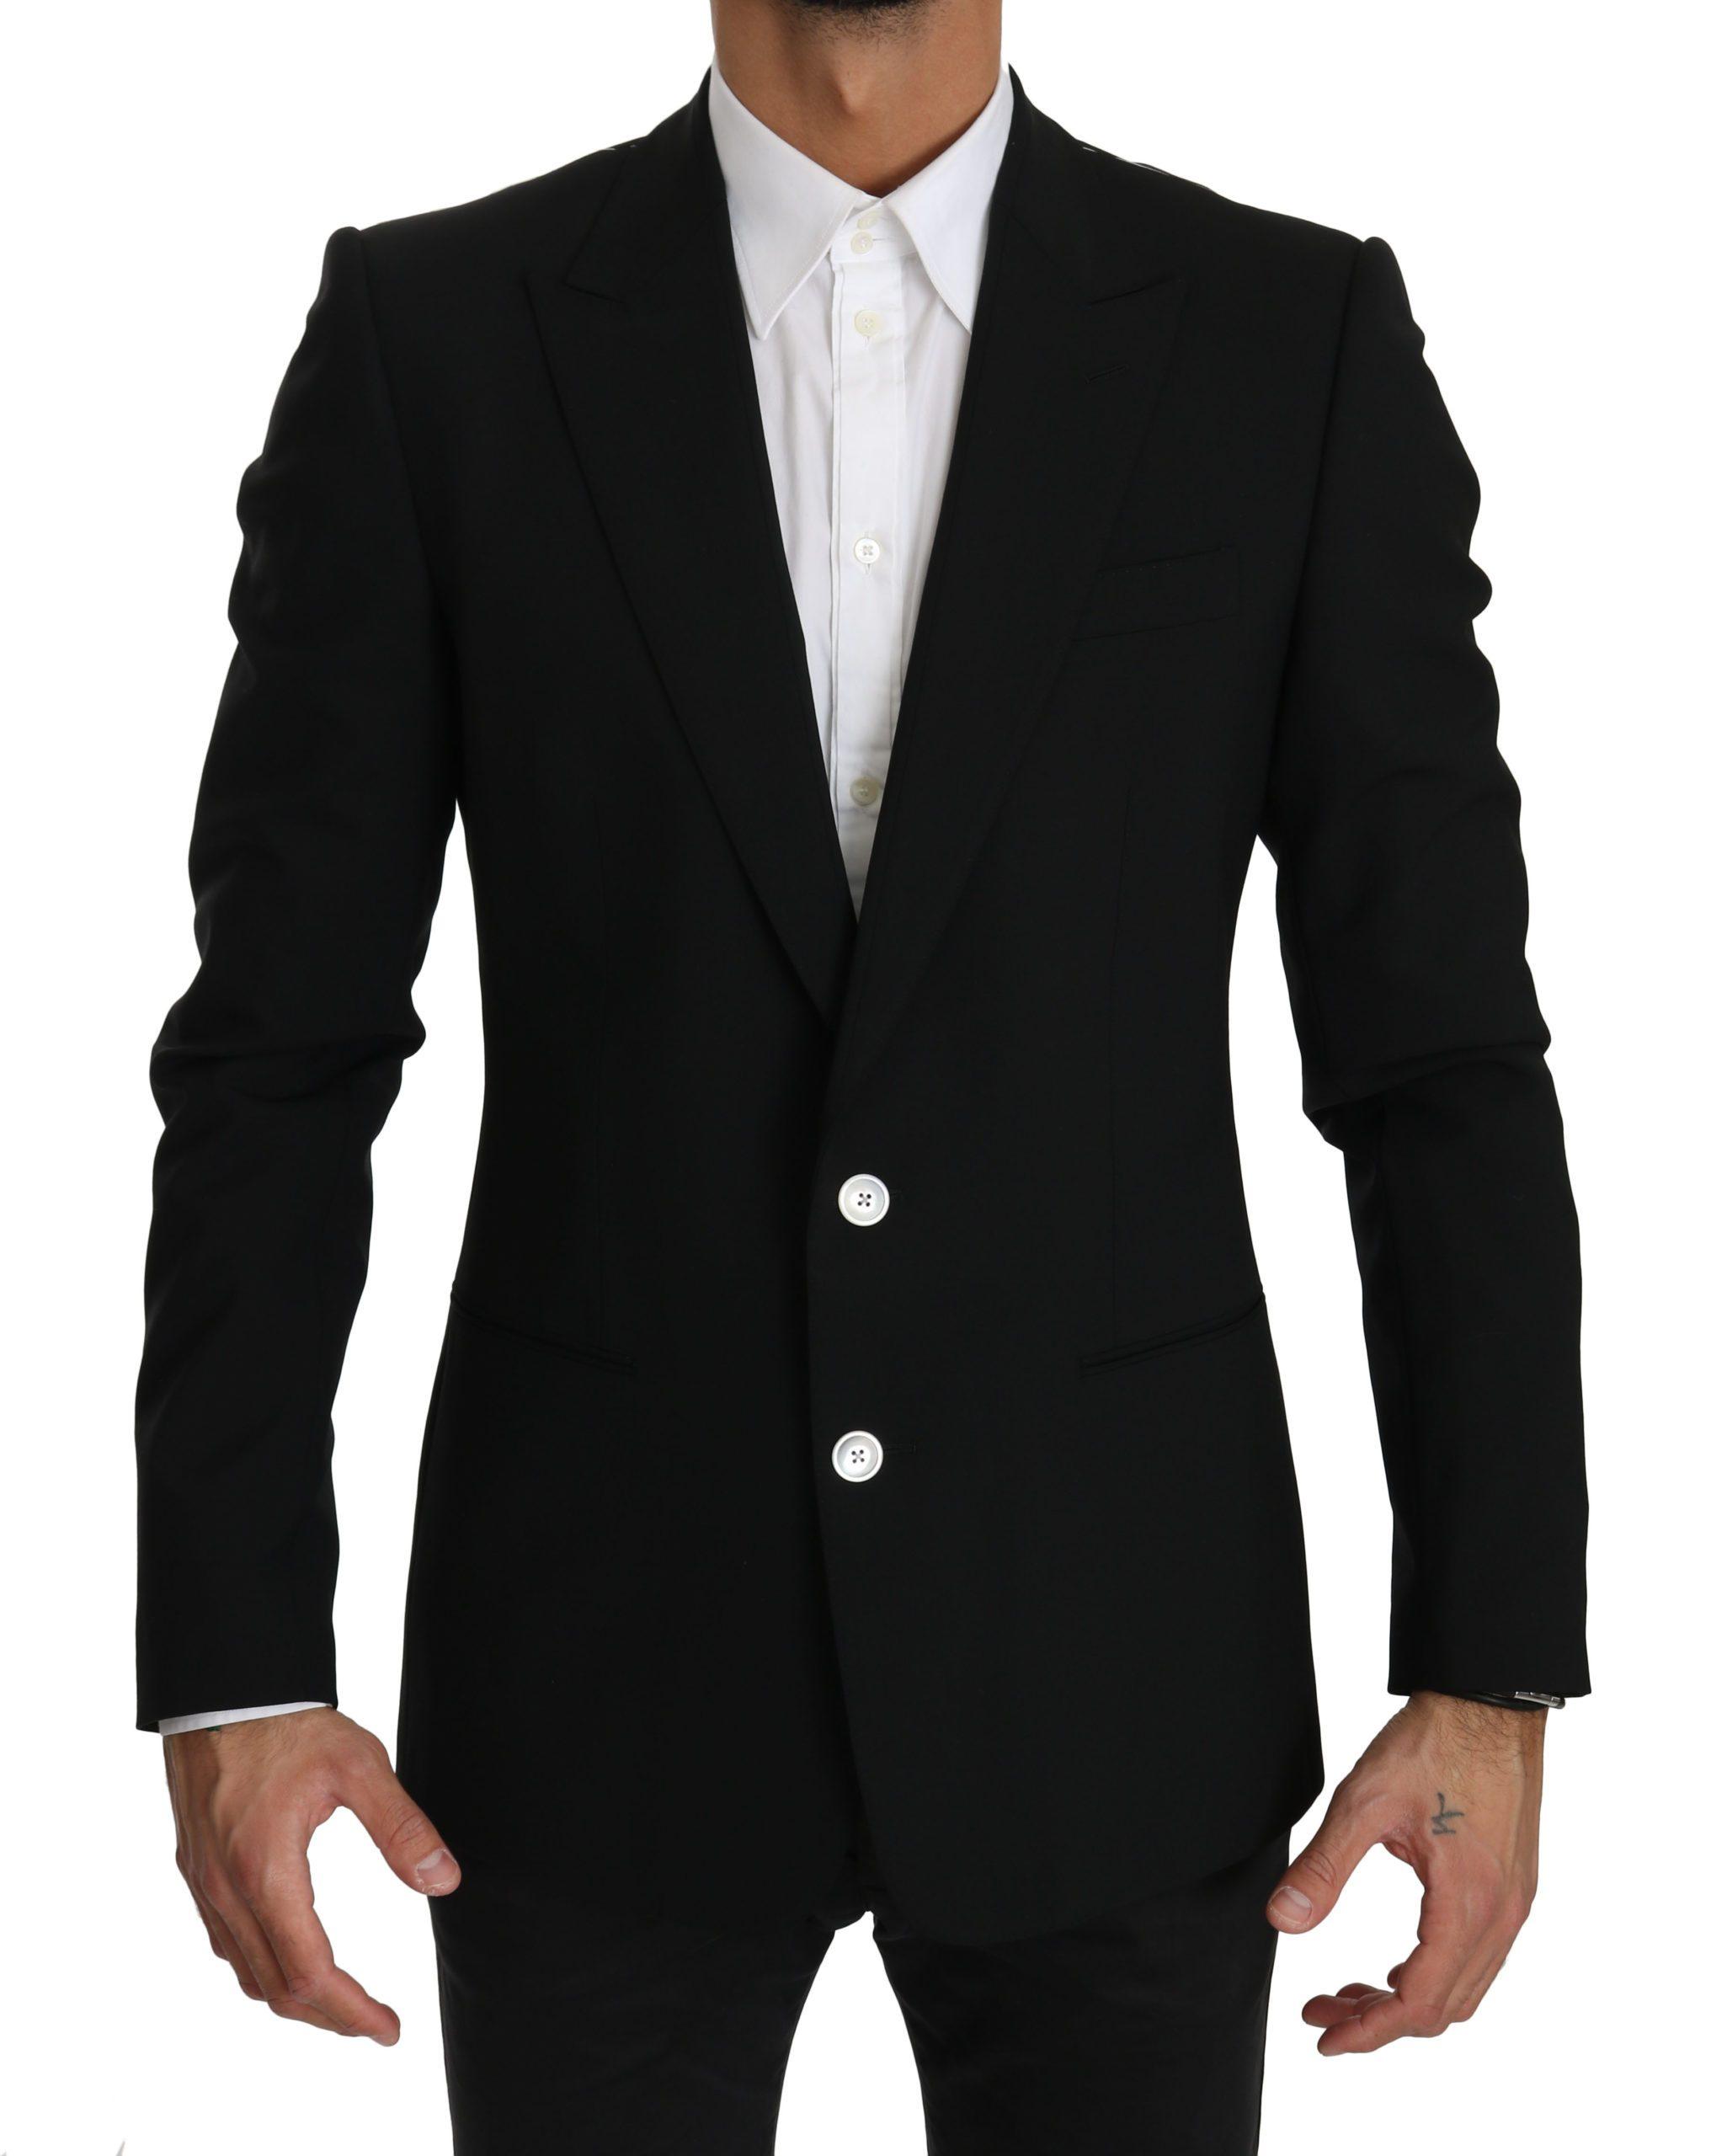 Dolce & Gabbana Men's Slim Fit Wool Blazer Black JKT2483 - IT48   M